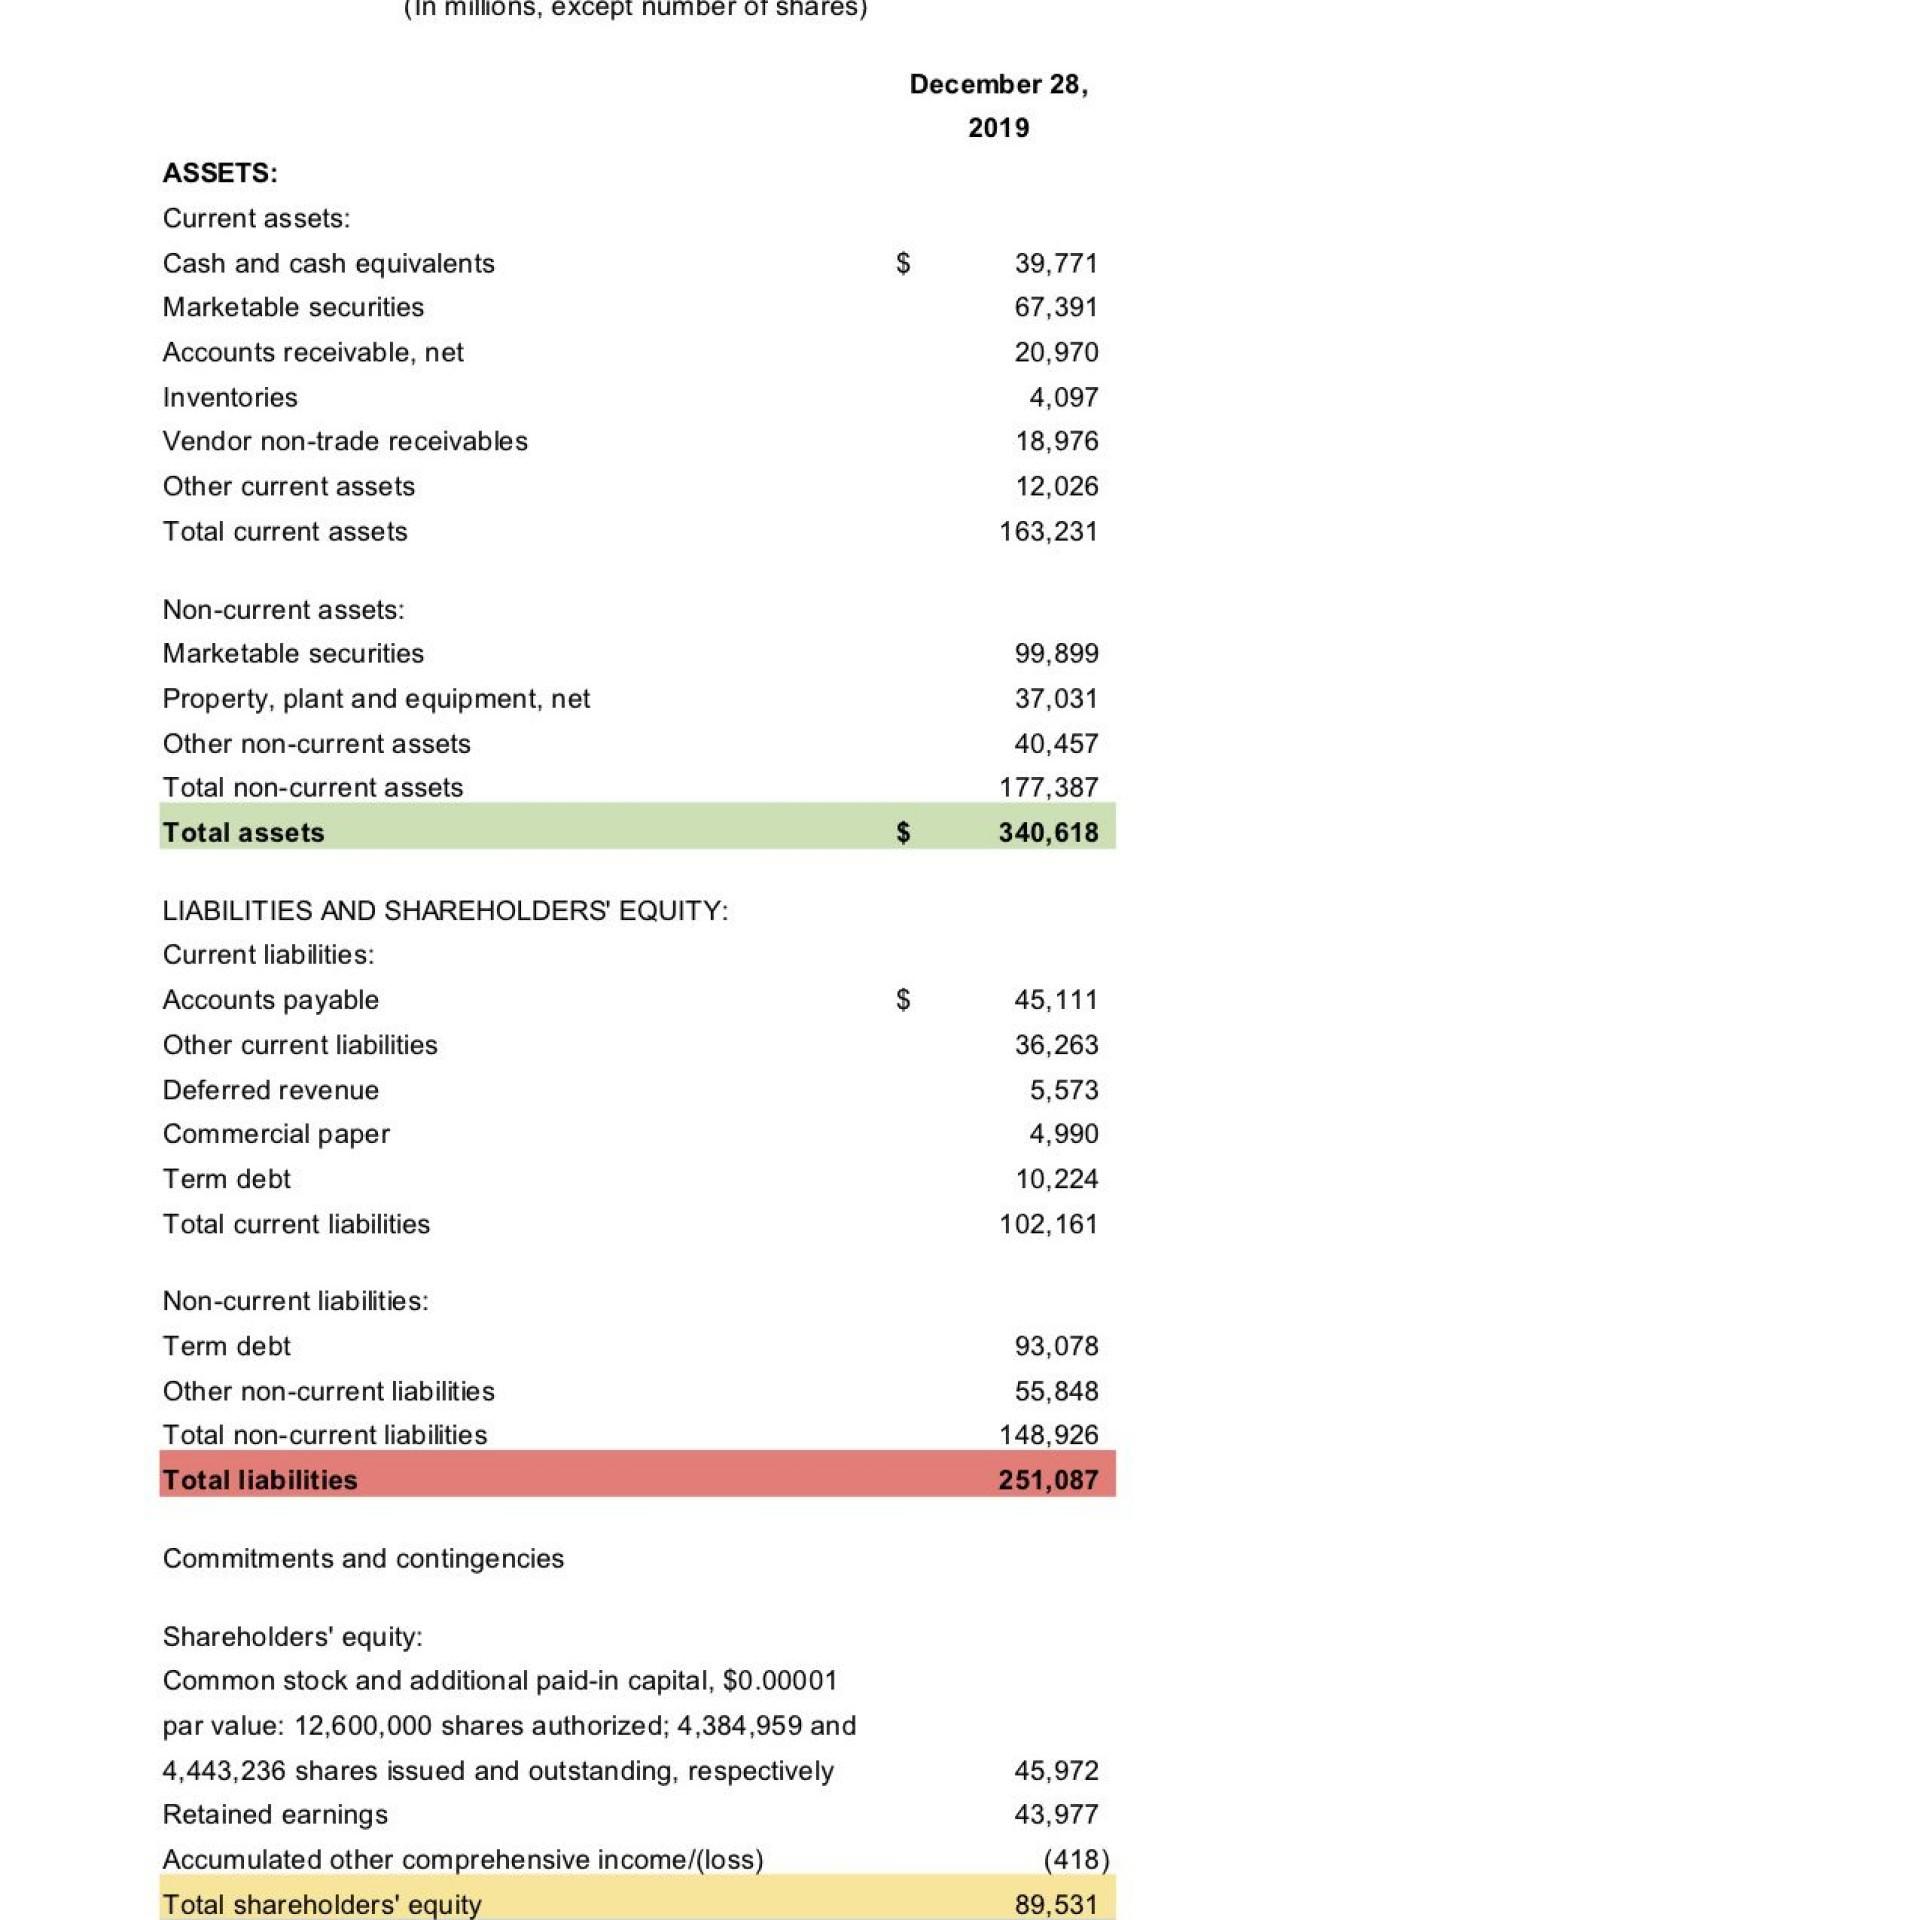 008 Surprising Basic Balance Sheet Template Design  Simple Free For Self Employed Example Uk1920